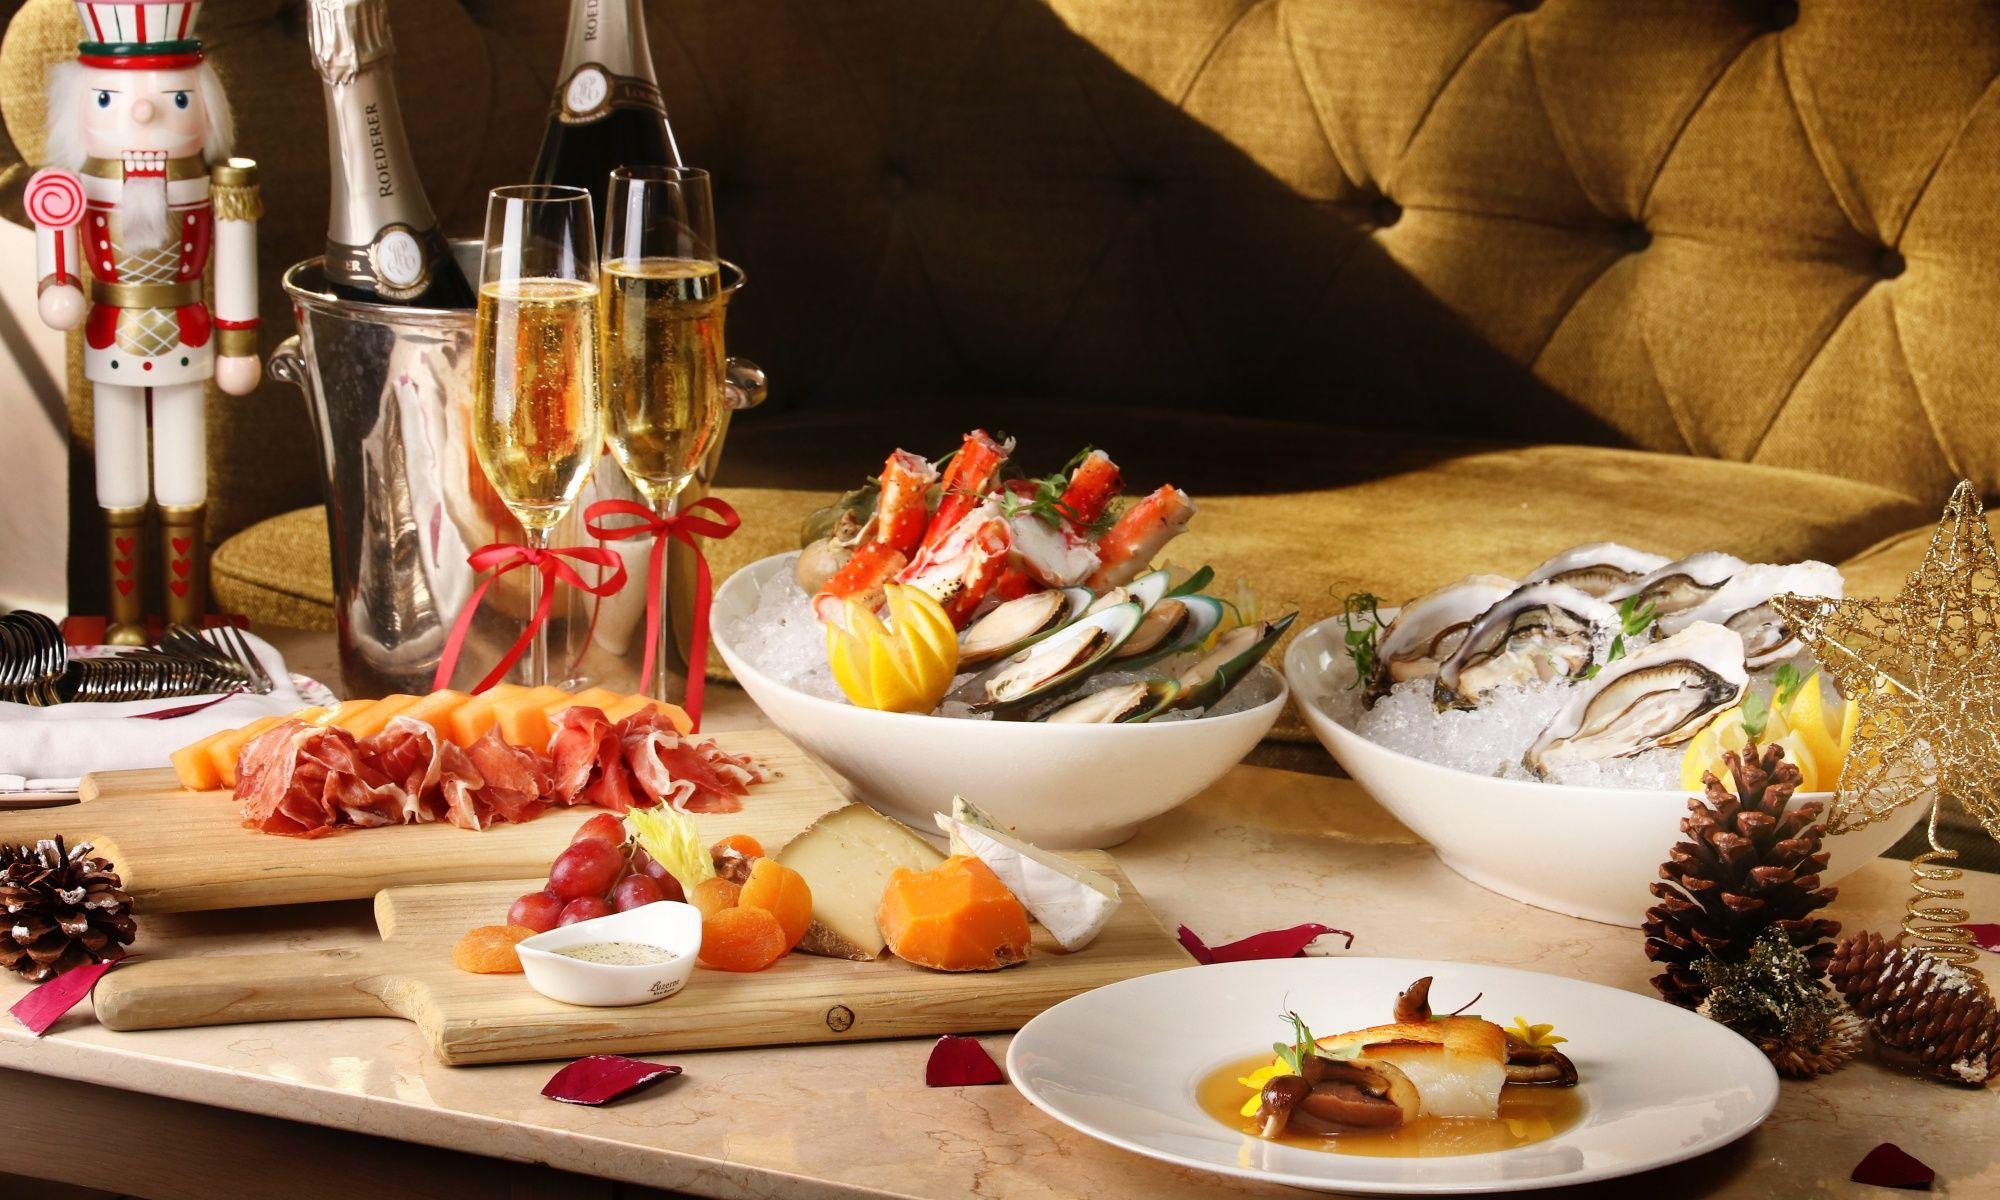 Maison Es Celebrates The Joyous Holidays With Festive Brunch And Dinner Menus